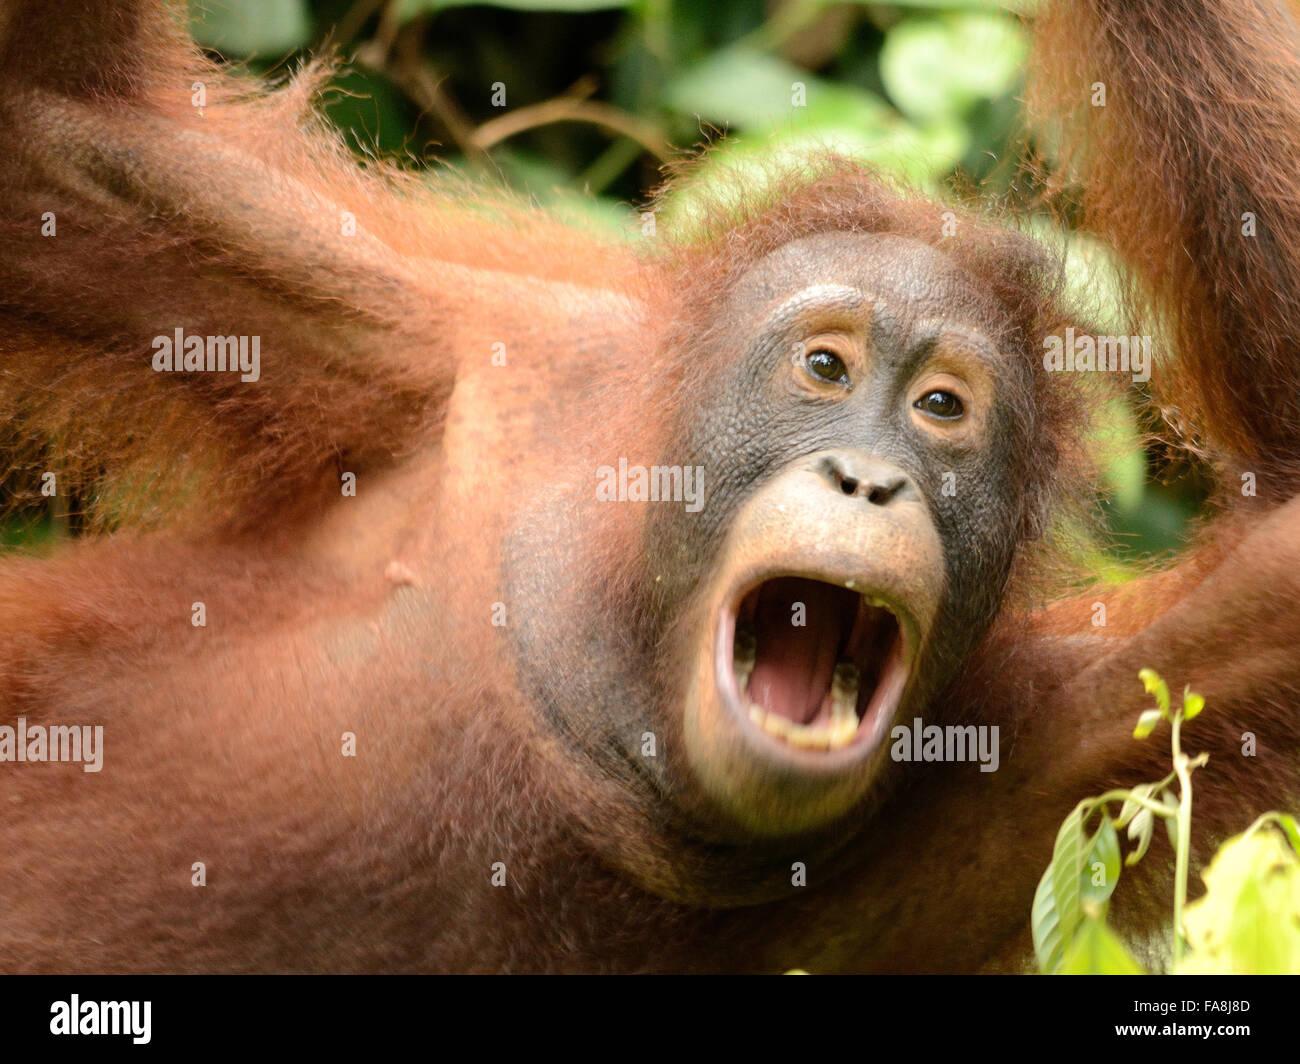 Orangutan in Sepilok Orangutan centro di riabilitazione Immagini Stock